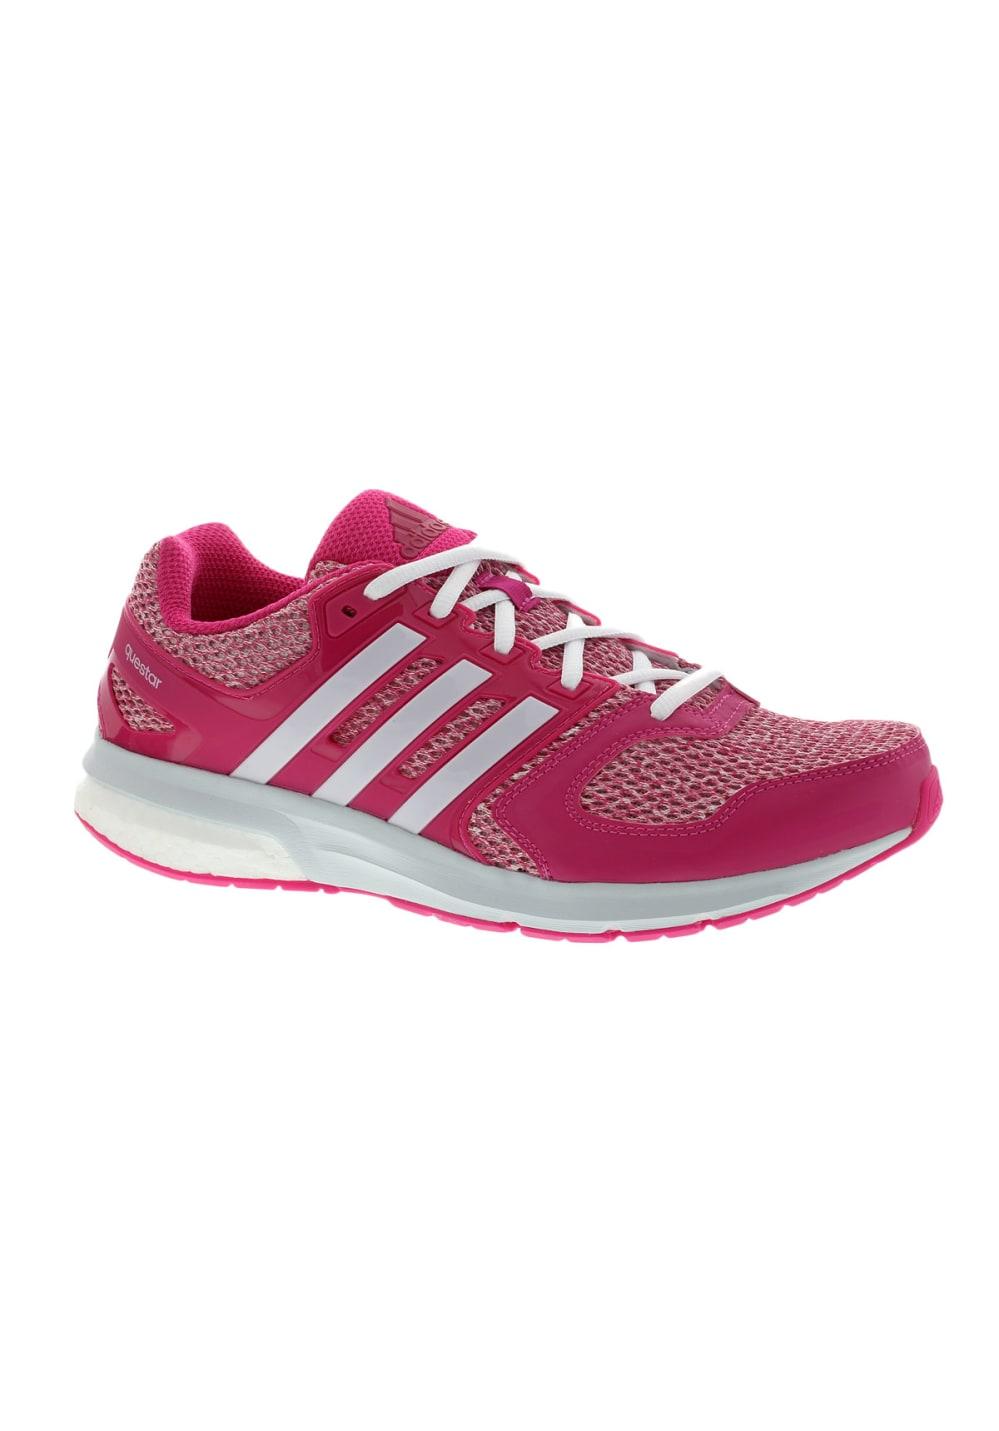 adidas Questar Boost Chaussures running pour Femme Rose